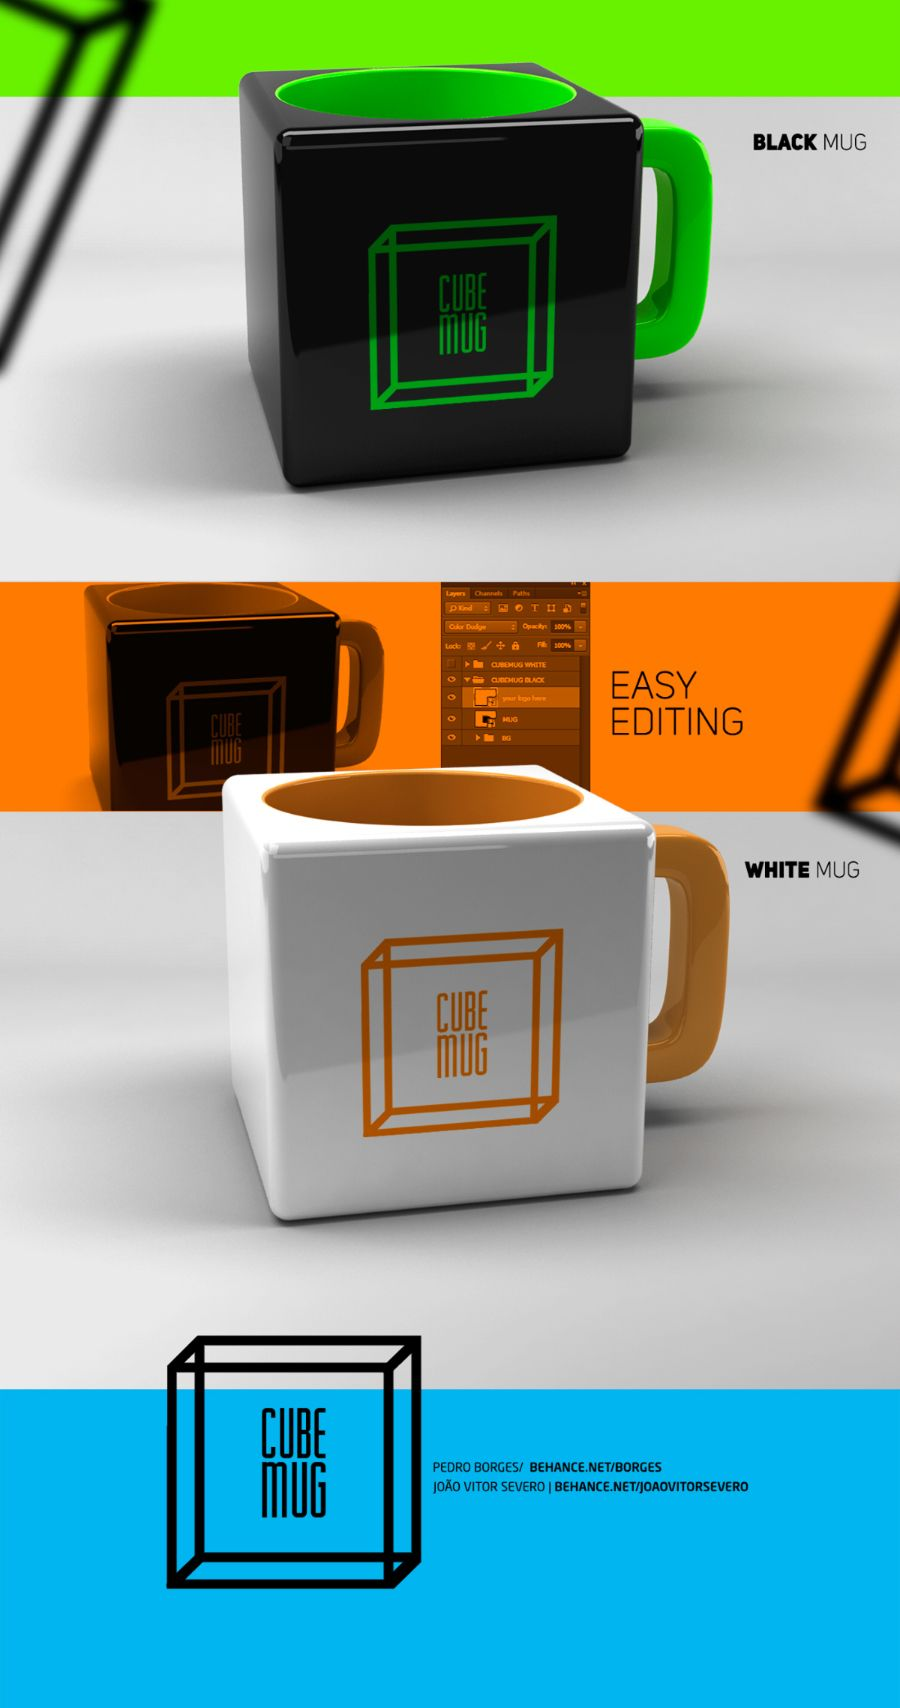 c1a57ffbd0d Free Cube Mug Mockup PSD (14.15 MB)